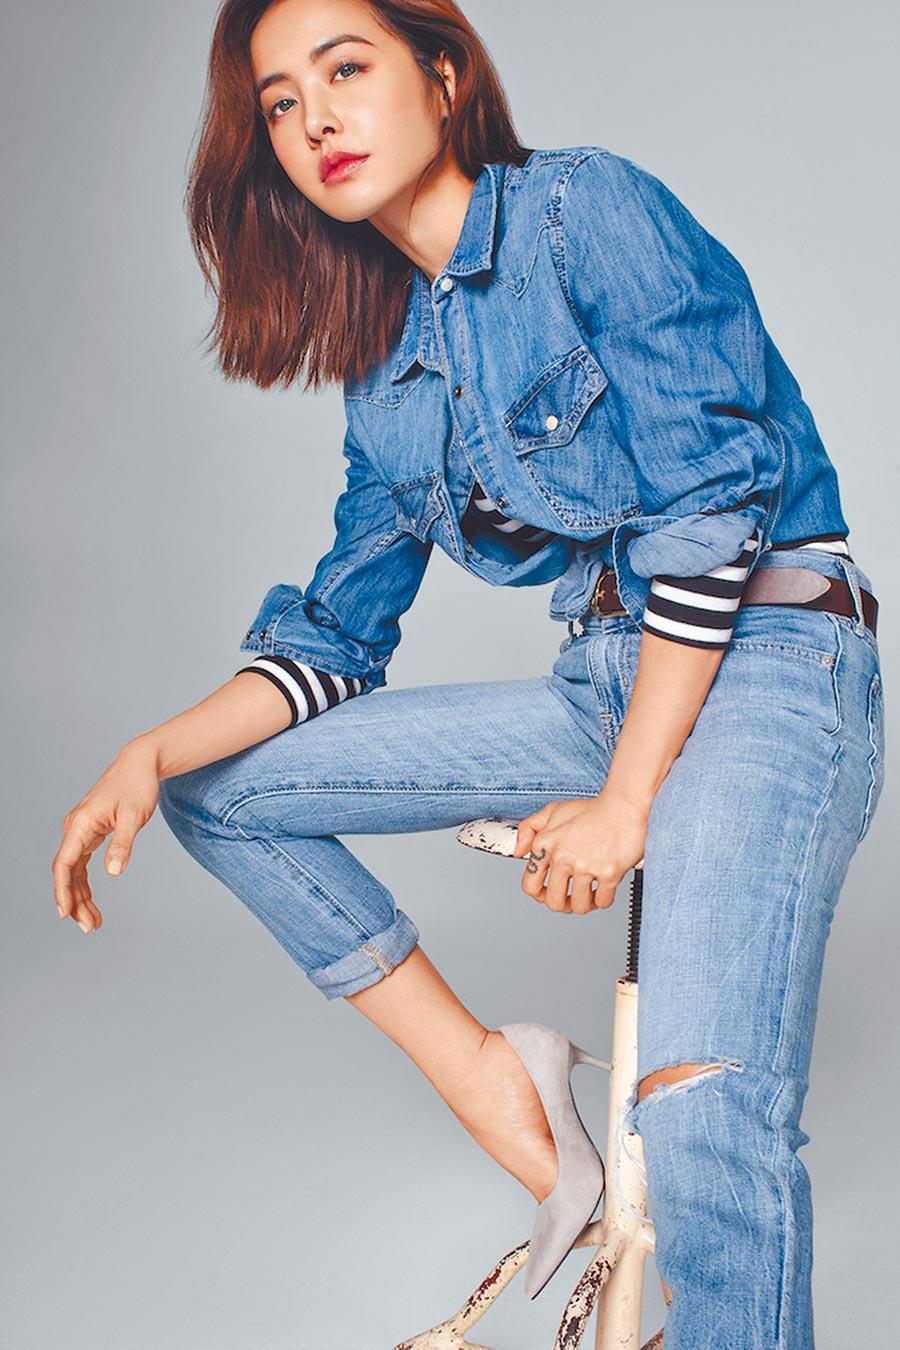 Jolin演繹Gap修身男友風牛仔褲,成為台灣丹寧風代表女星之一。(Gap提供)